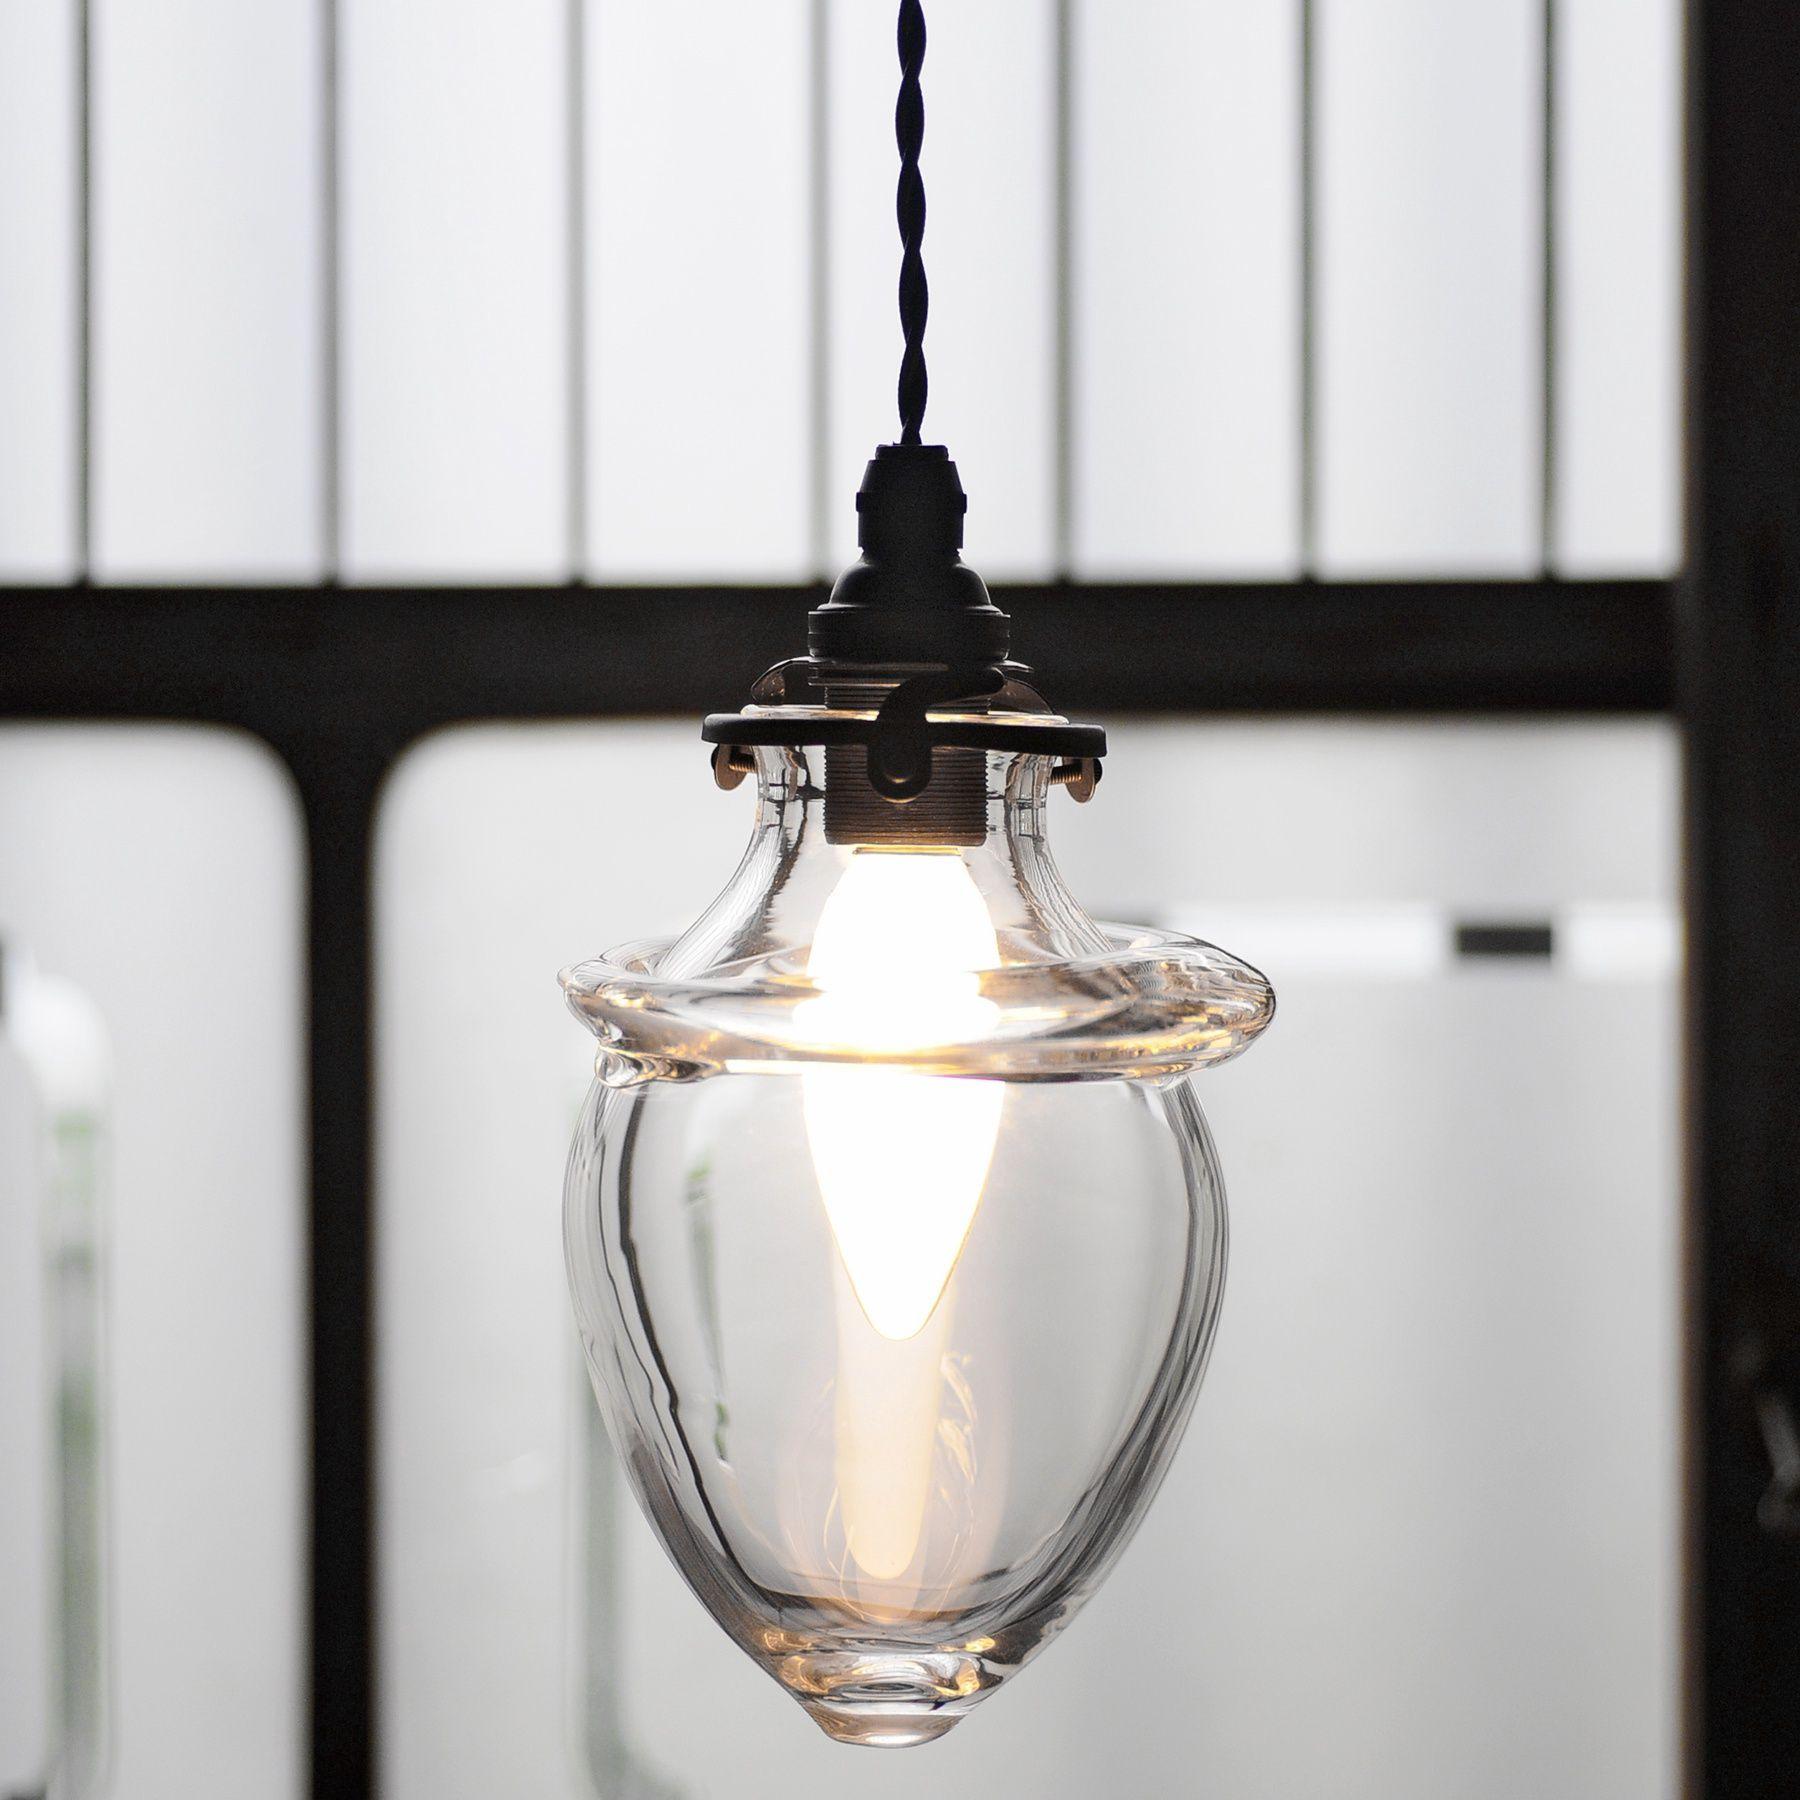 Hallway lighting modern  Lighting ideas to light up your modern hallway  Lighting Ideas for